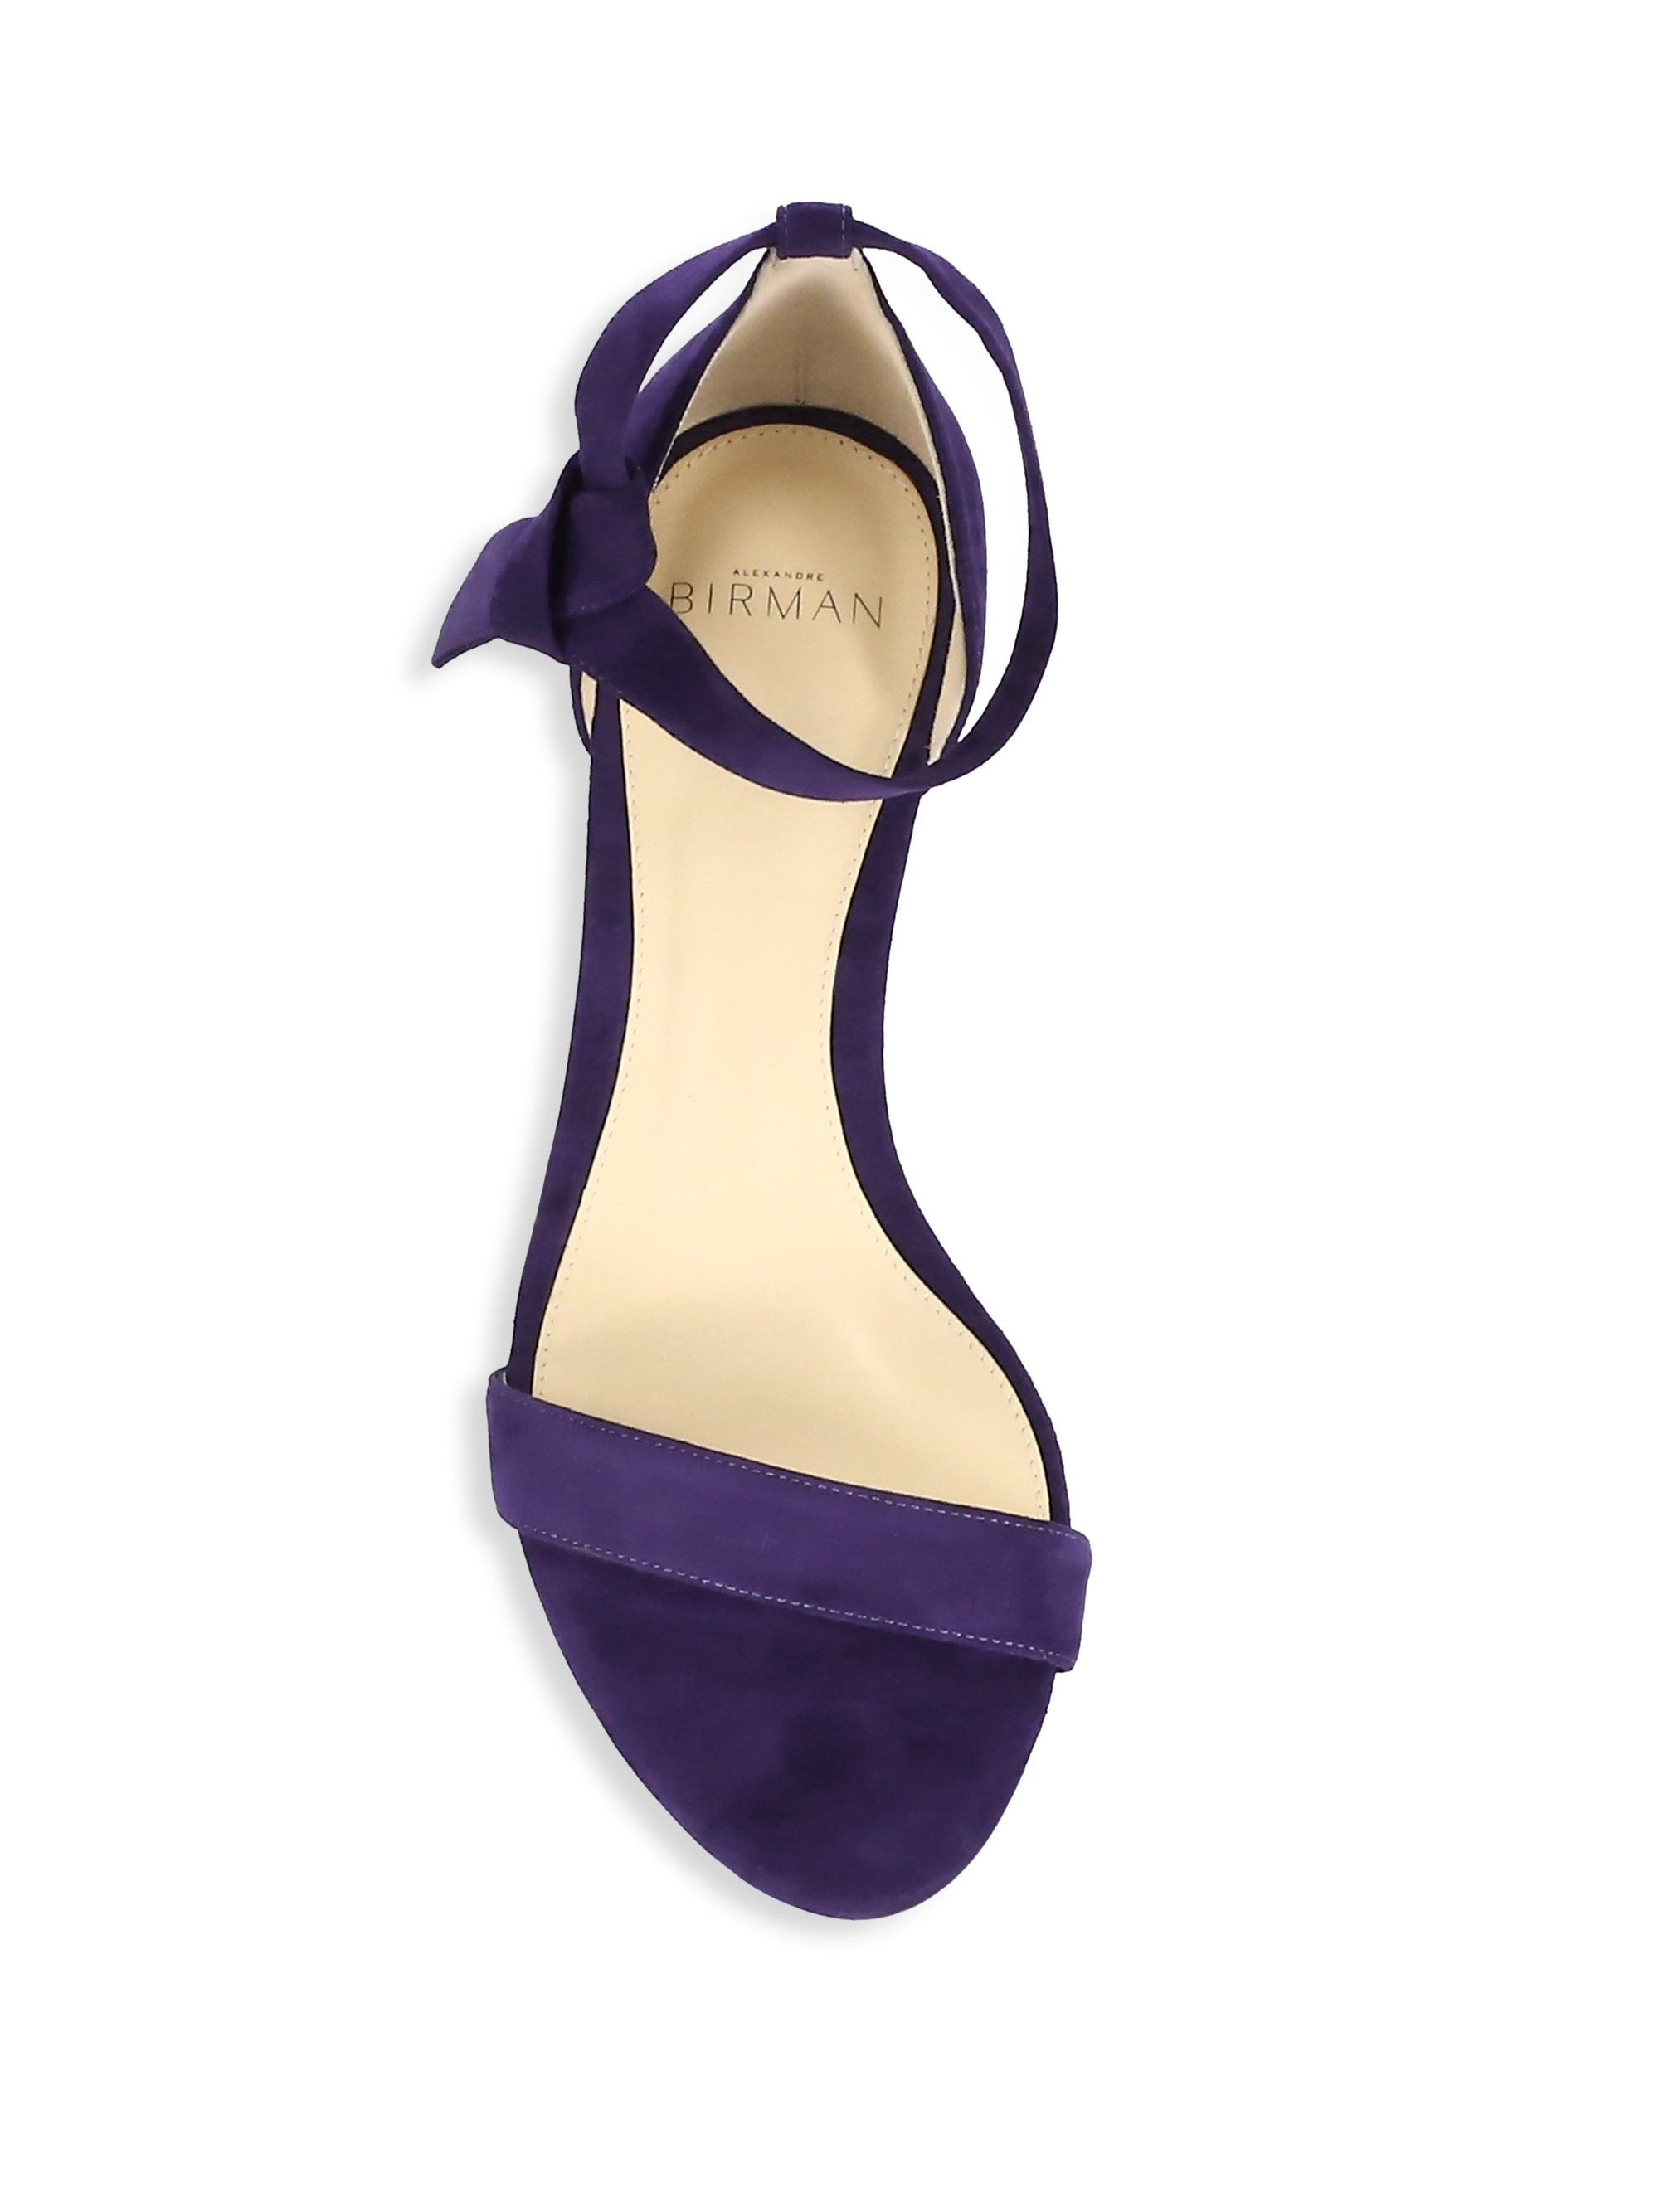 61a6b15d5273 Alexandre Birman Clarita Suede Ankle-Tie Demi-Wedge Sandals - Bali ...